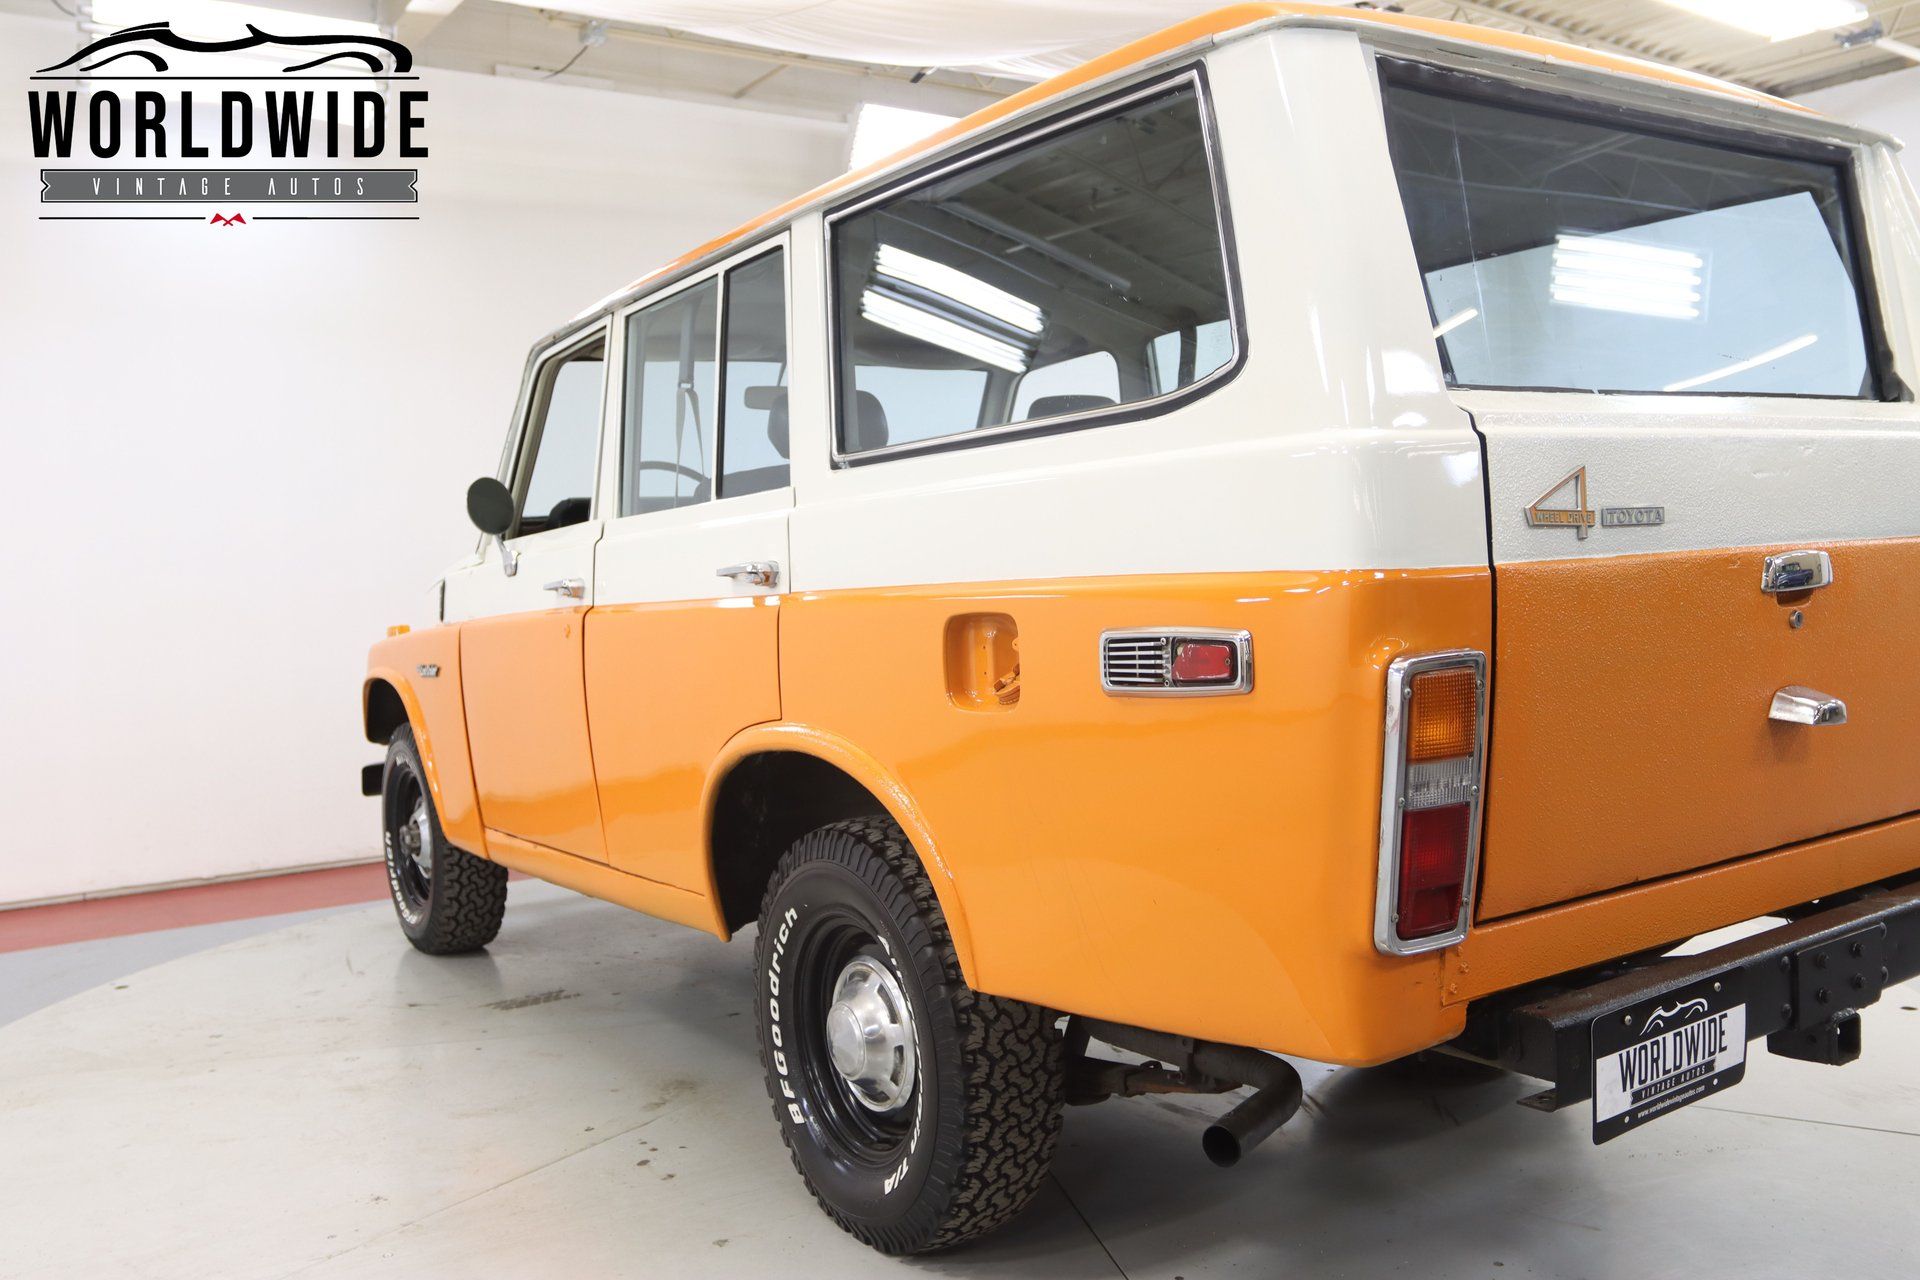 1979 Toyota FJ55 Land Cruiser